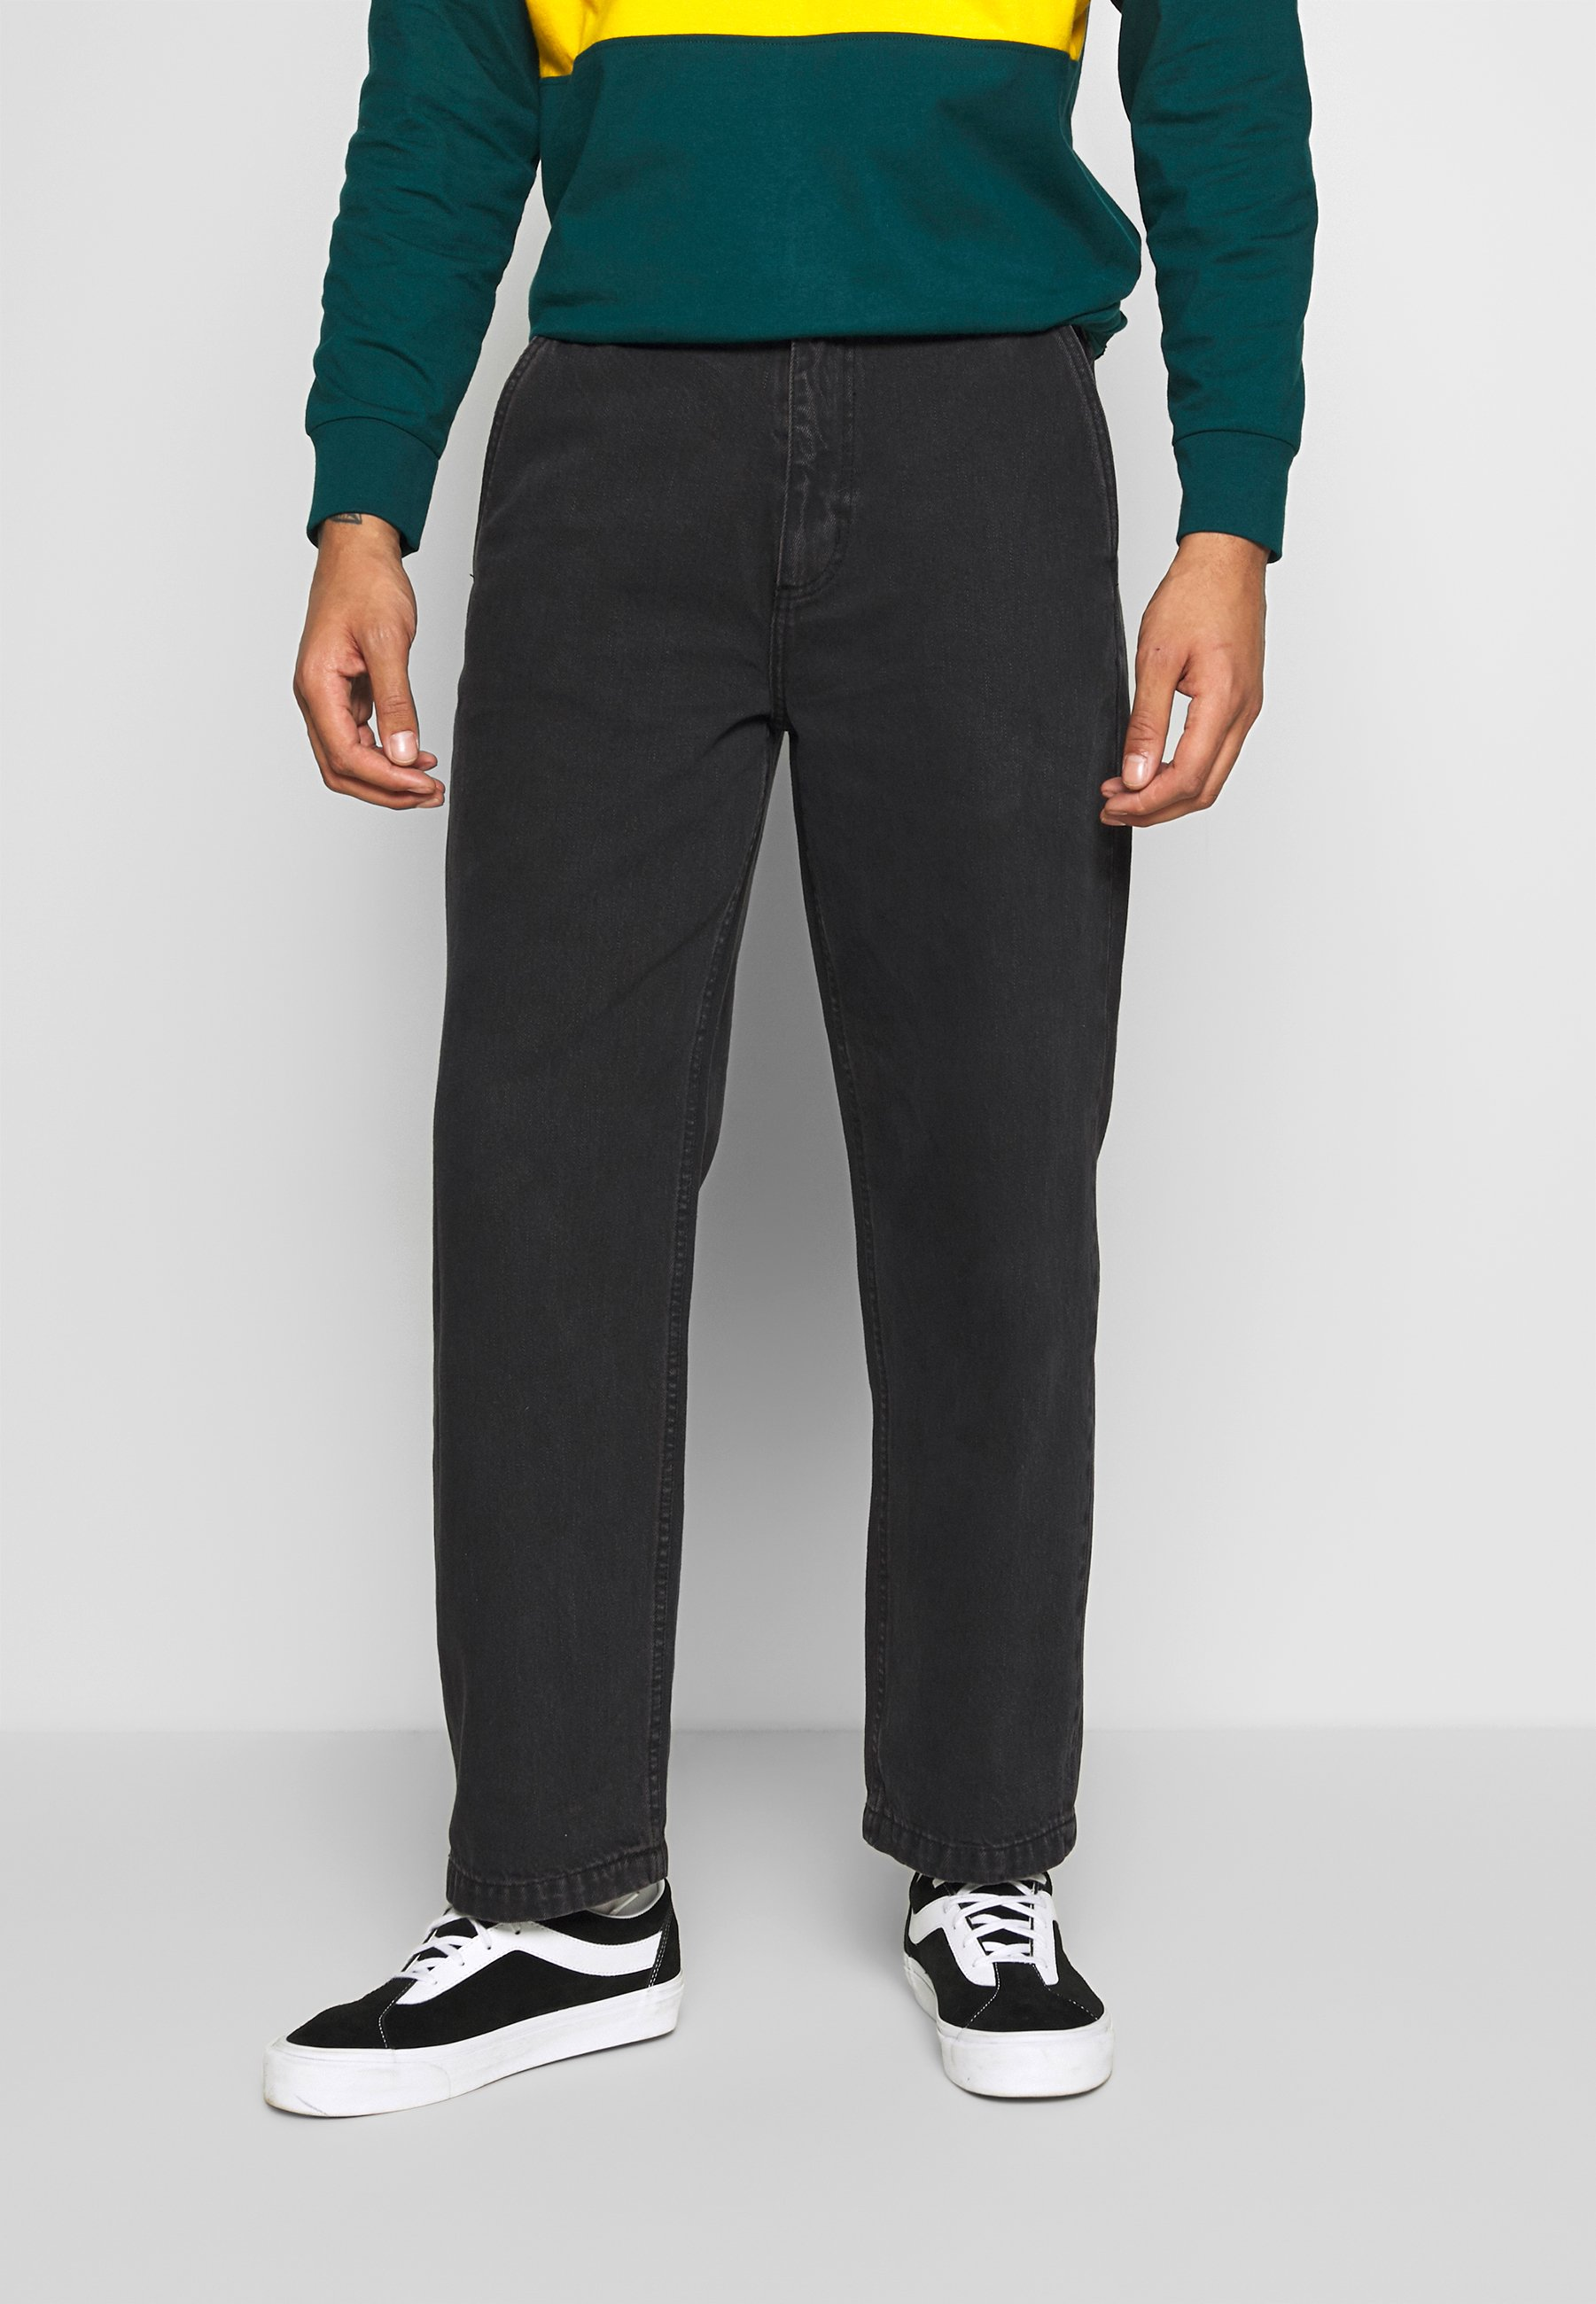 Obey Clothing Hard Work Carpenter - Jeans Baggy Dusty Black SlwXJiw